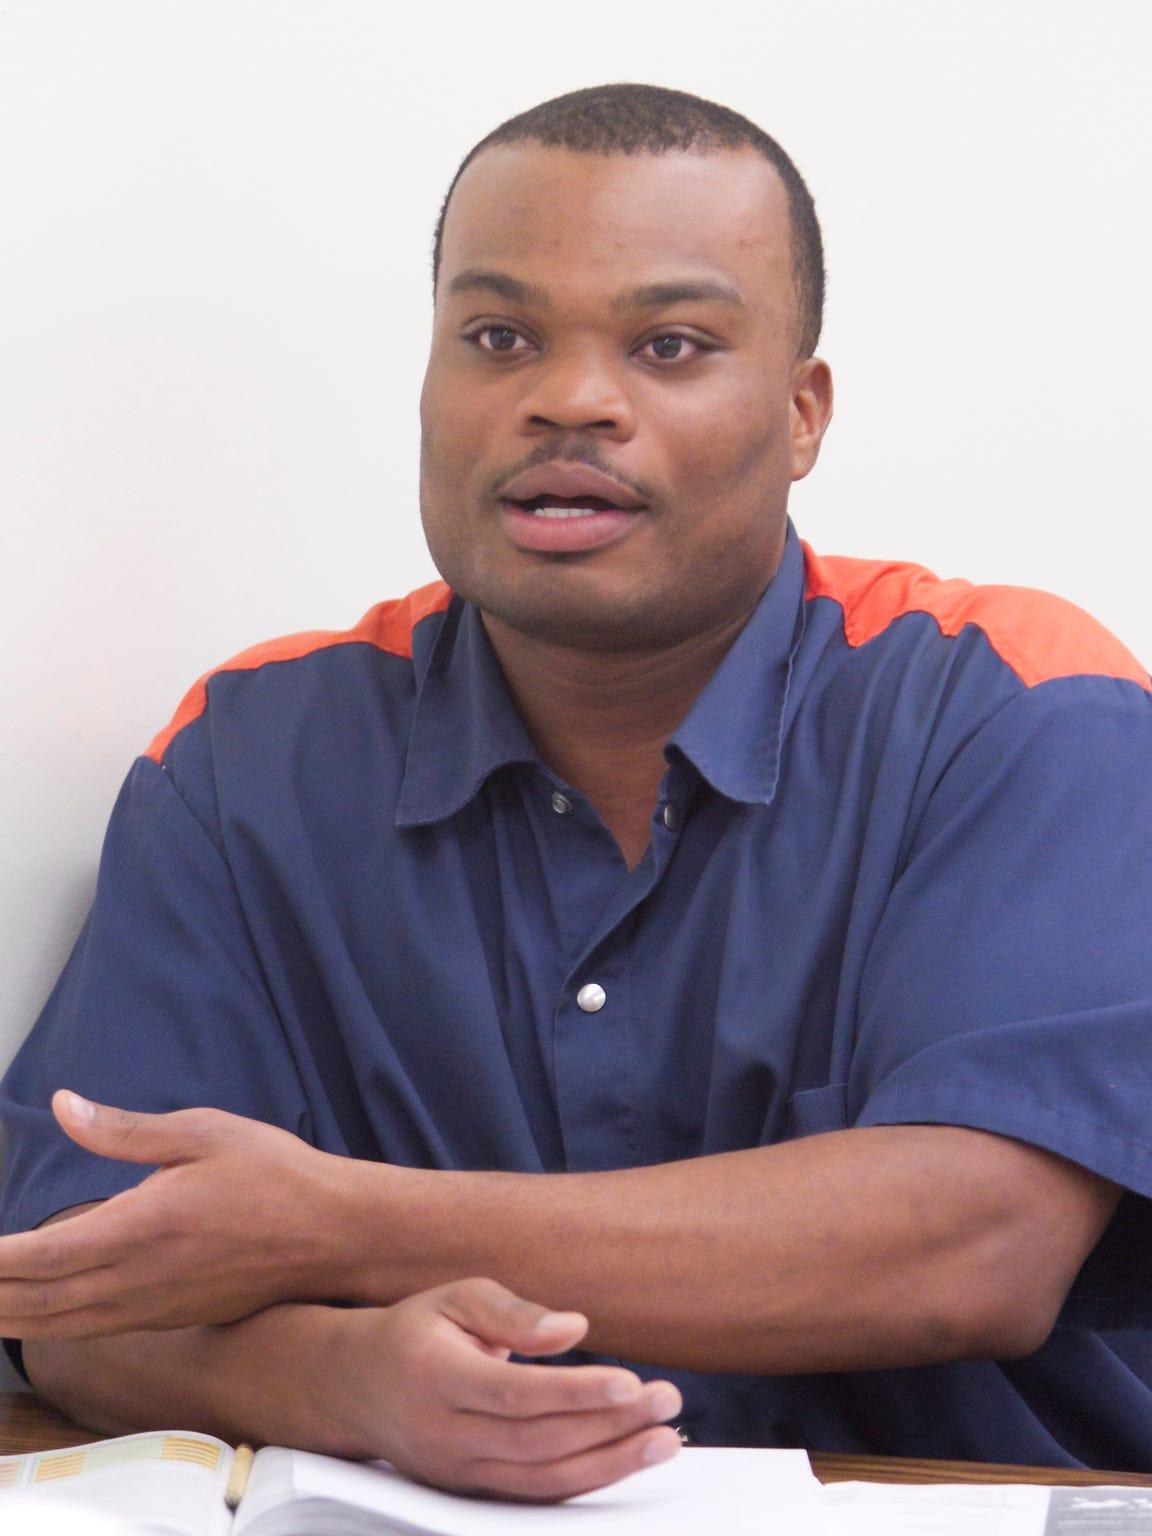 Bryan Stewart, an inmate student in a marketing class